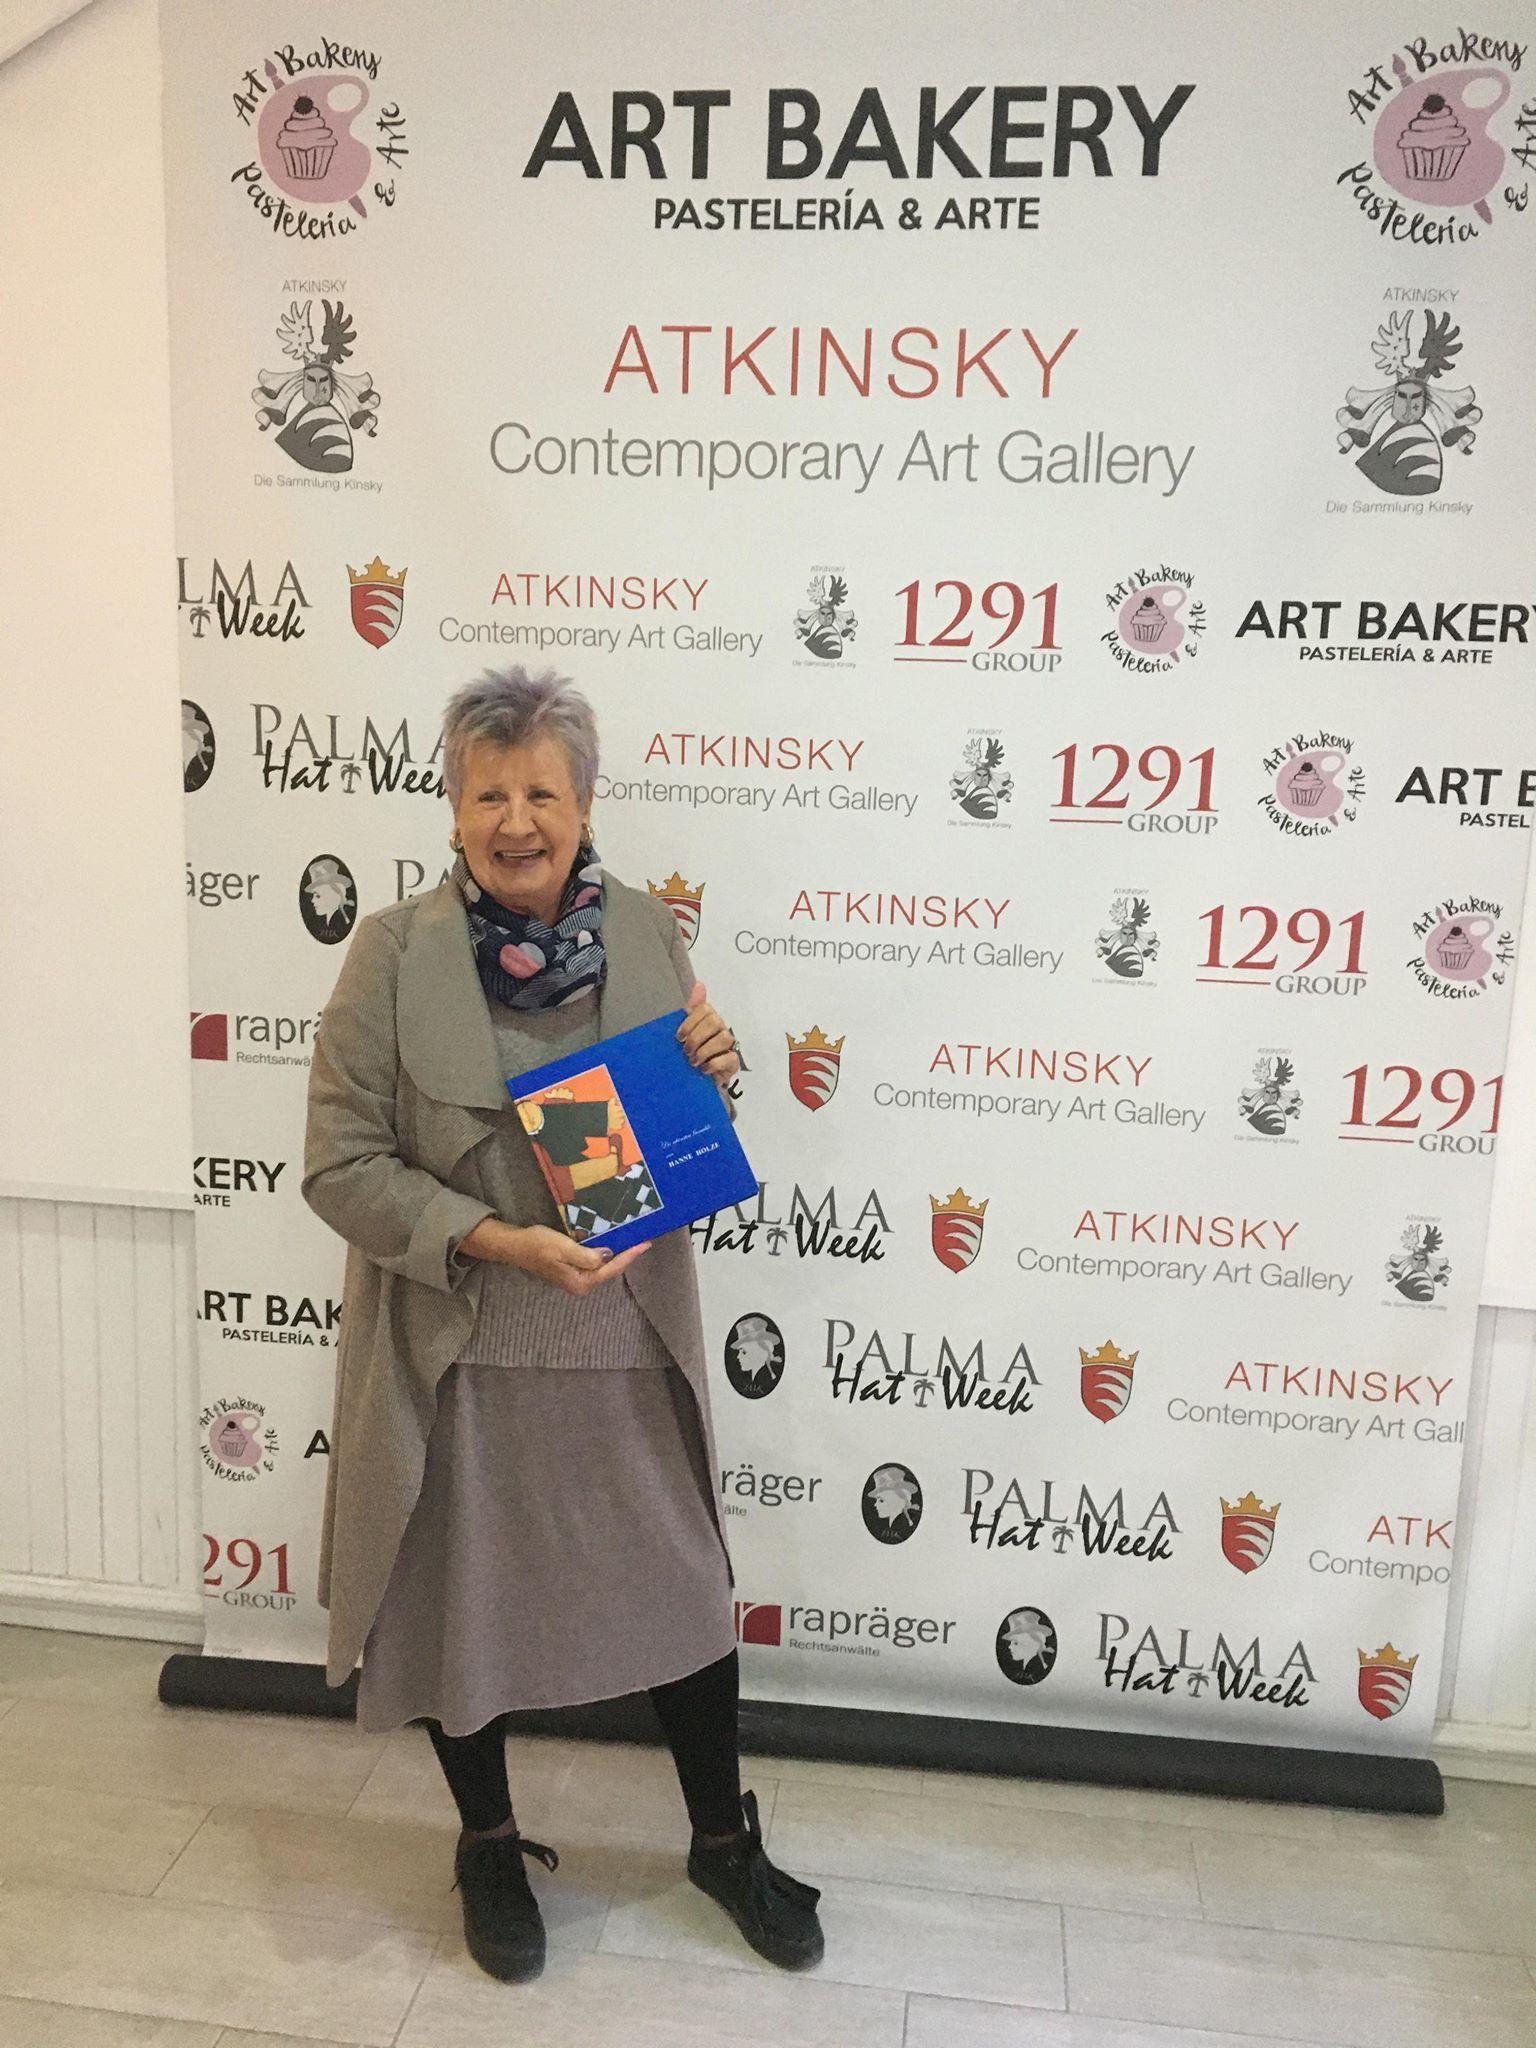 Art Bakery - Pastelería & Arte